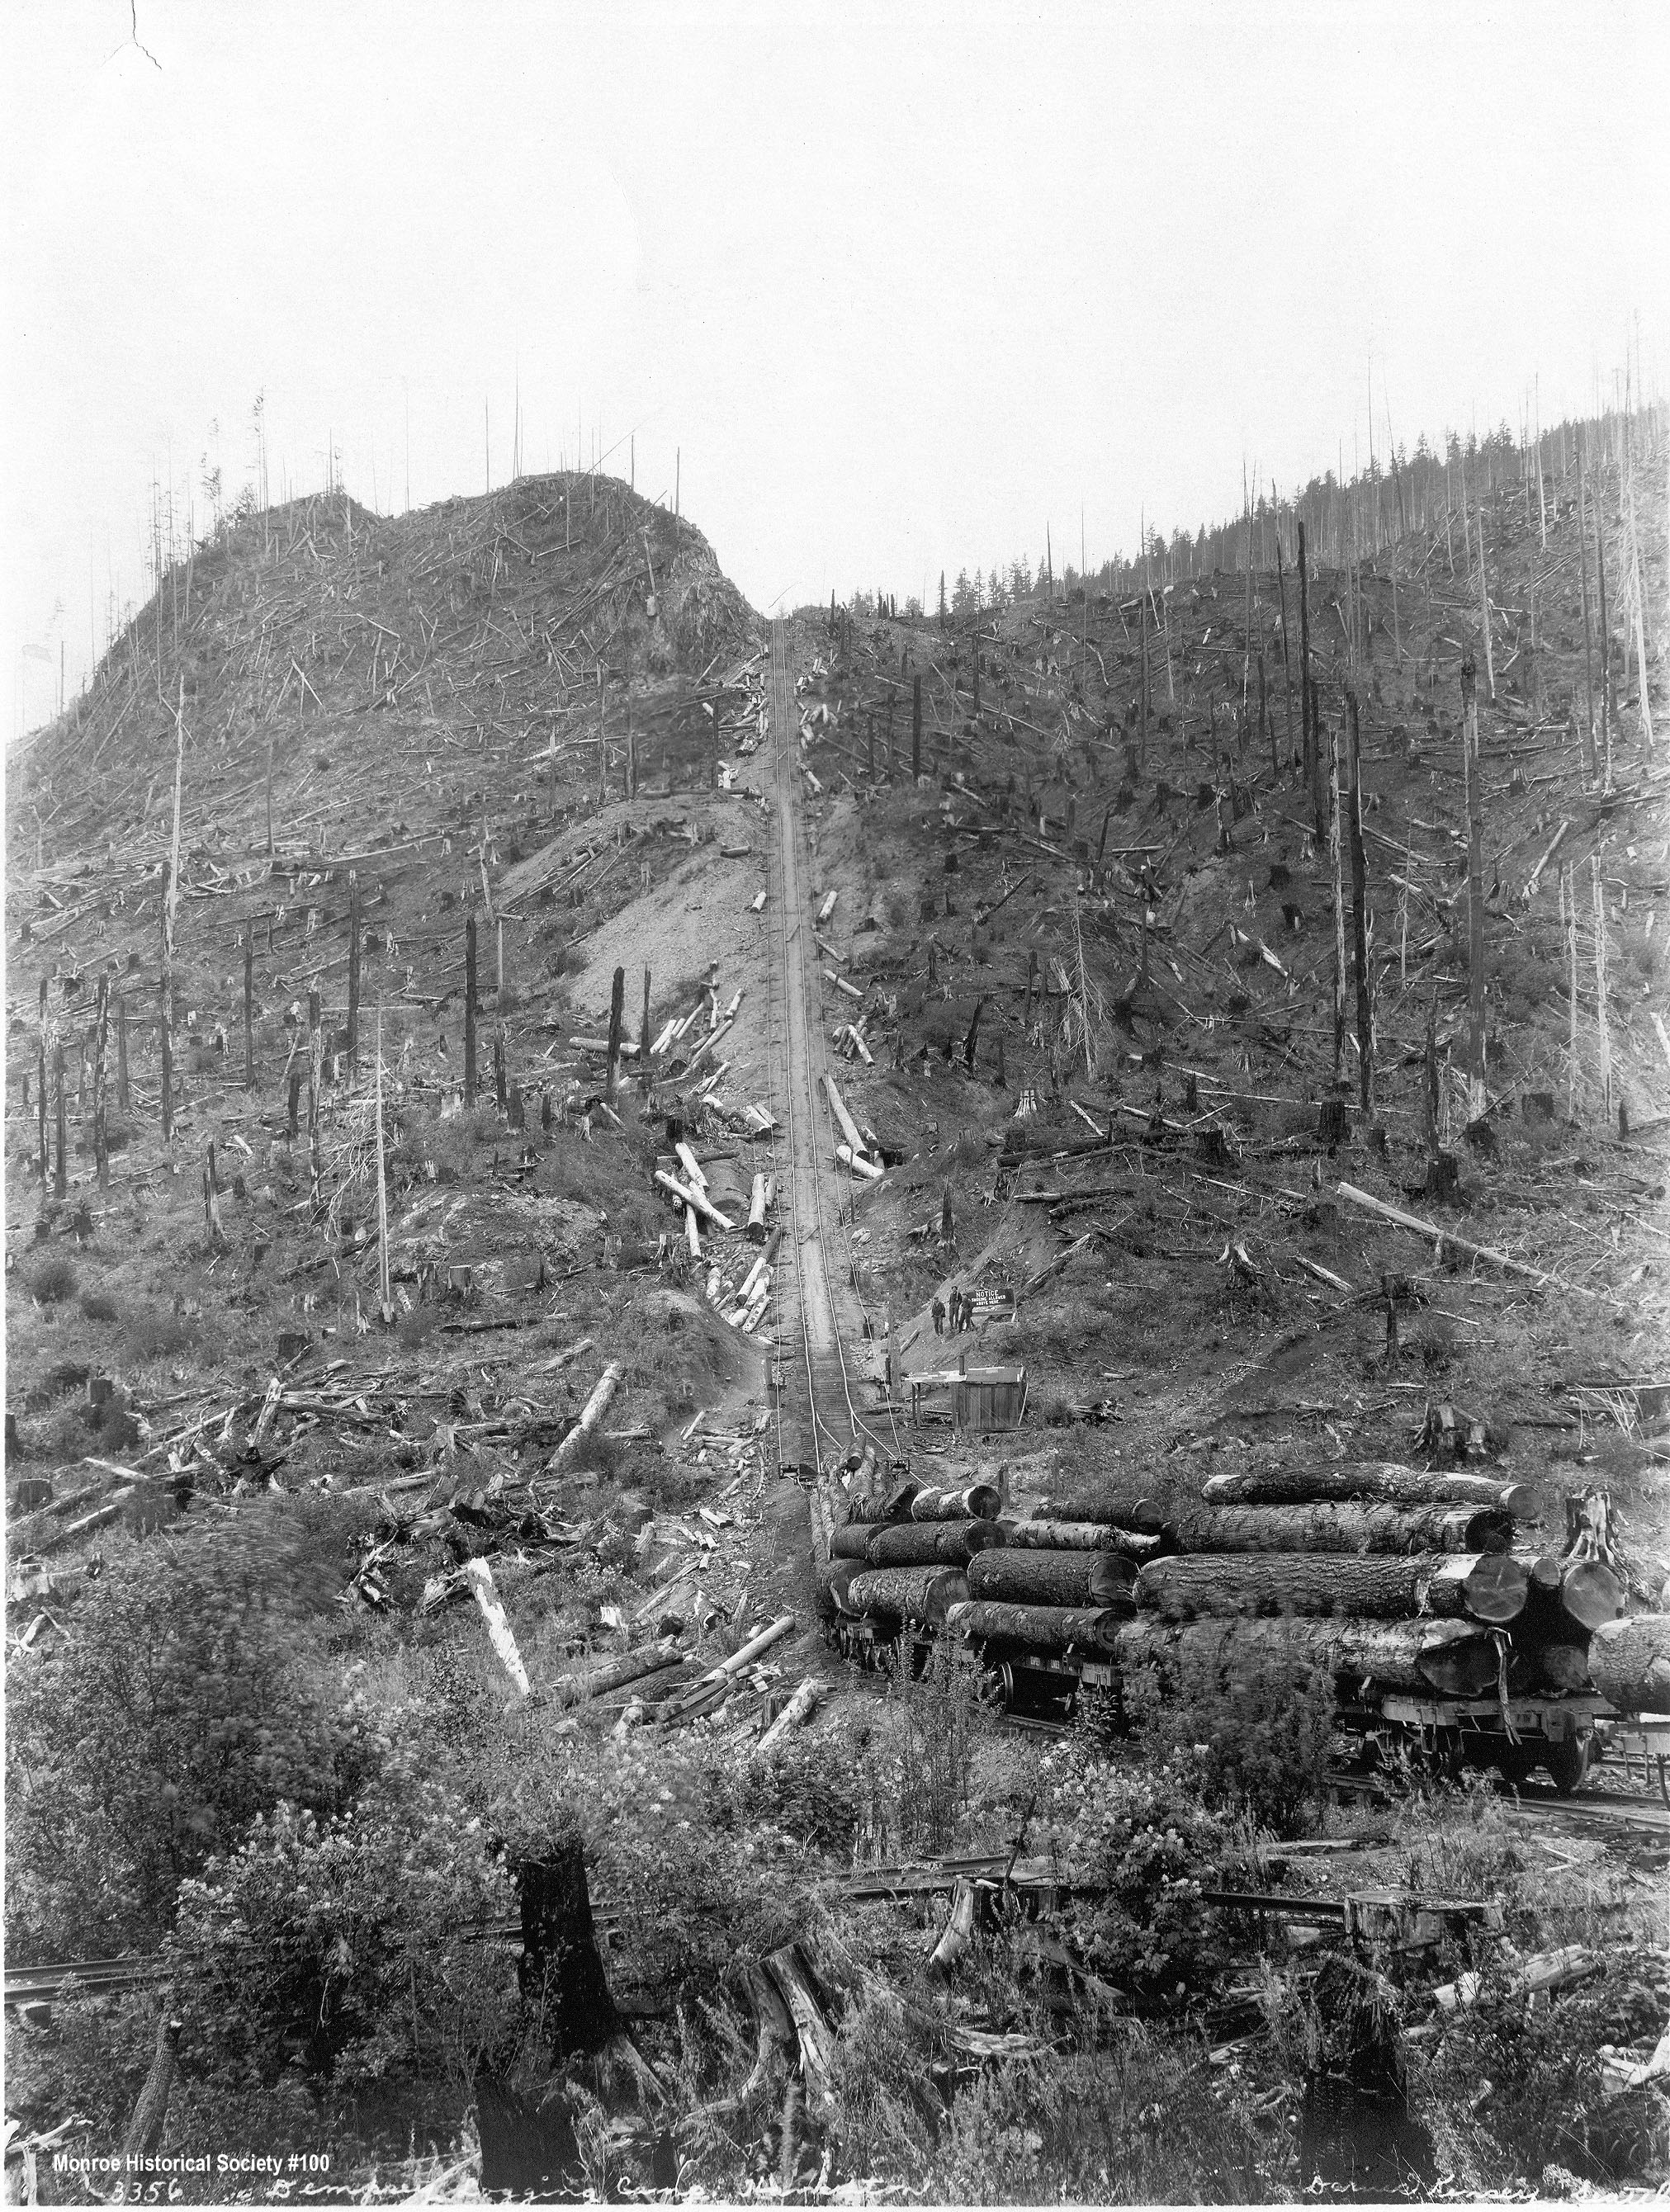 0100 – Dempsey Logging Camp, Hamilton, (Washington) 1924